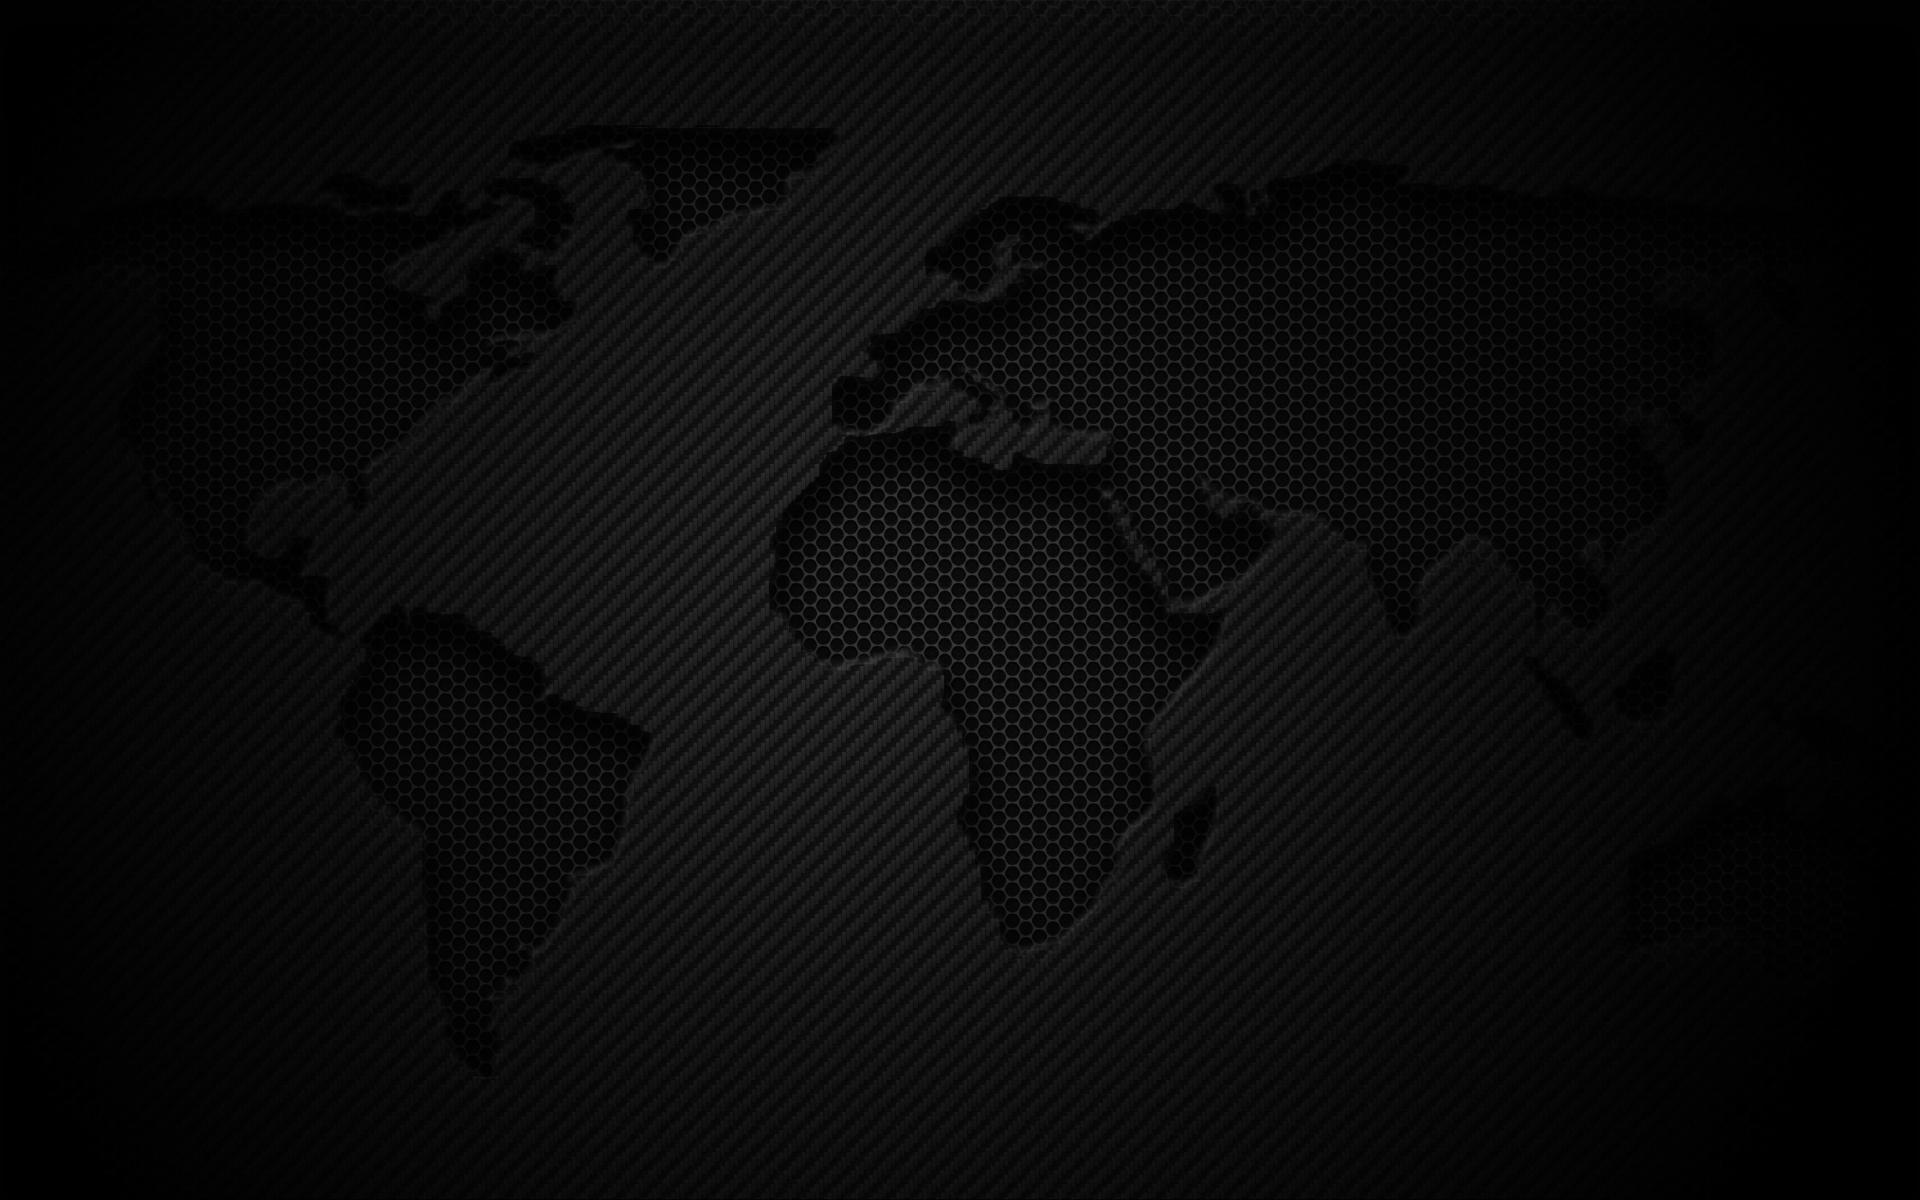 Black Cat Fall Wallpaper Hd Black Wallpapers Pixelstalk Net